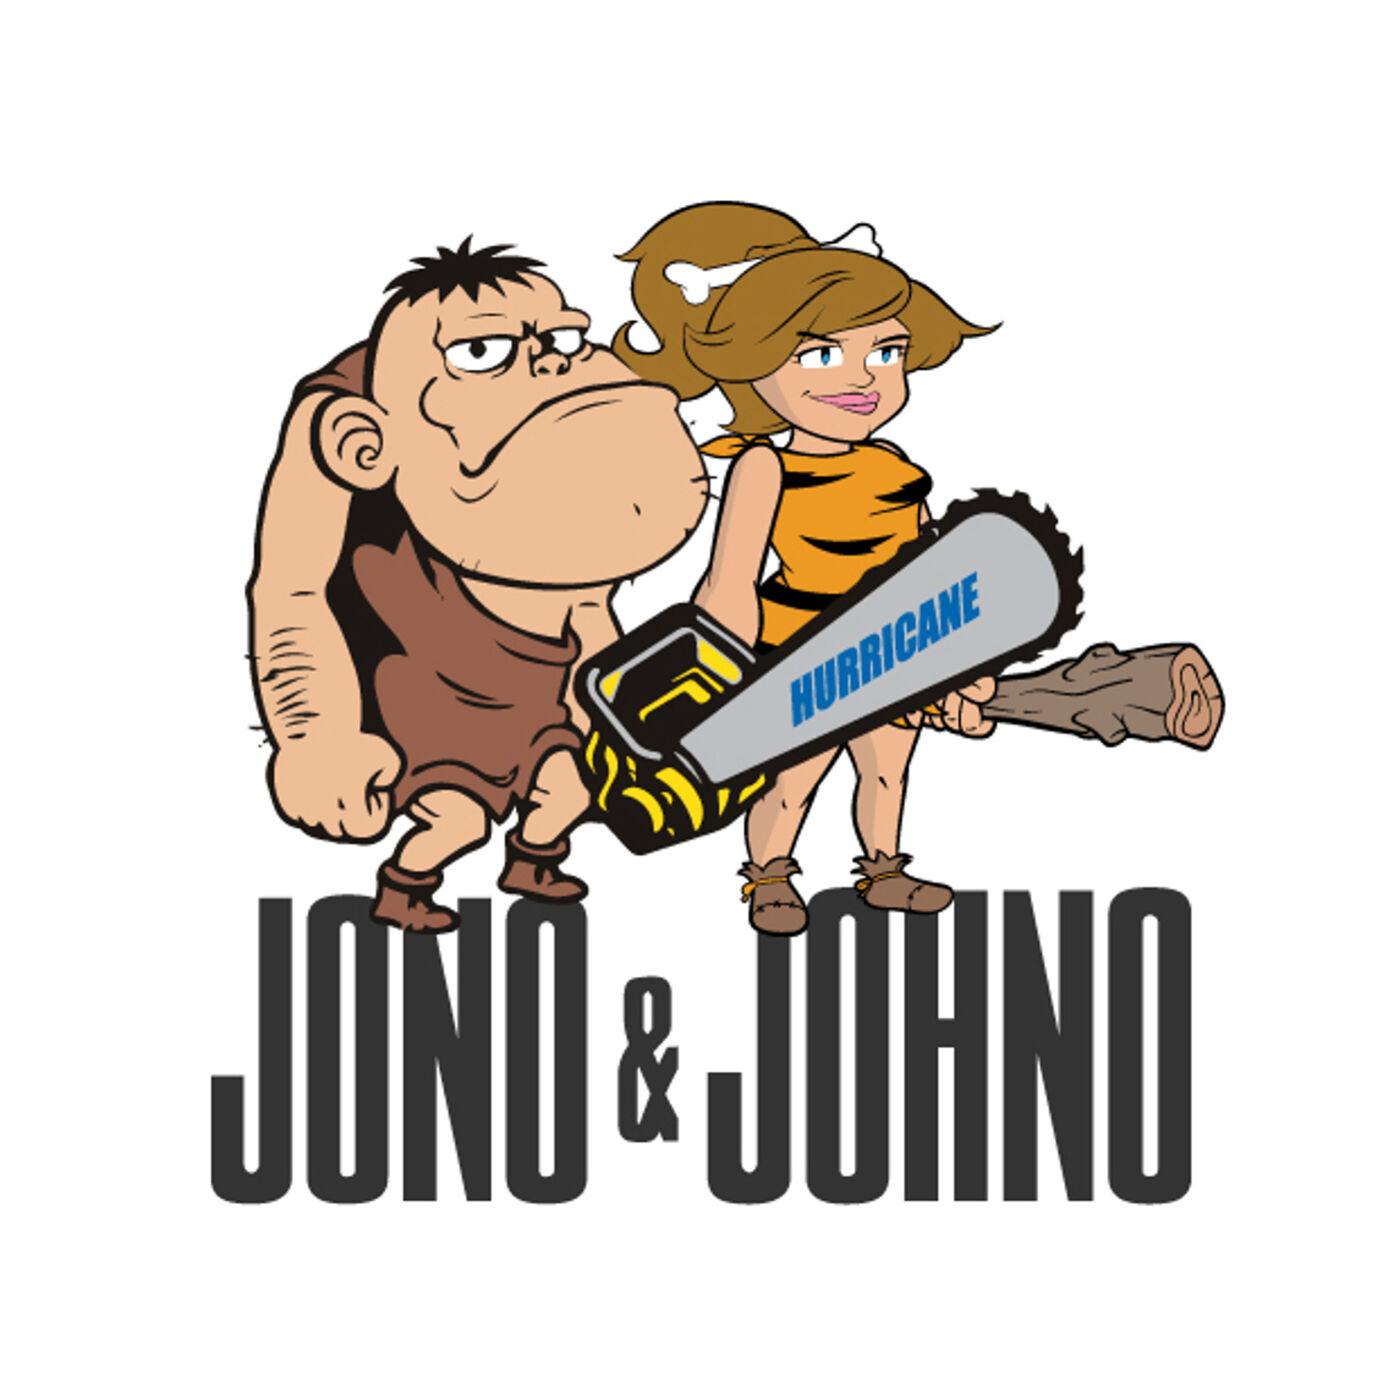 Episode 113 - Jono & Johno... and 'that ad'